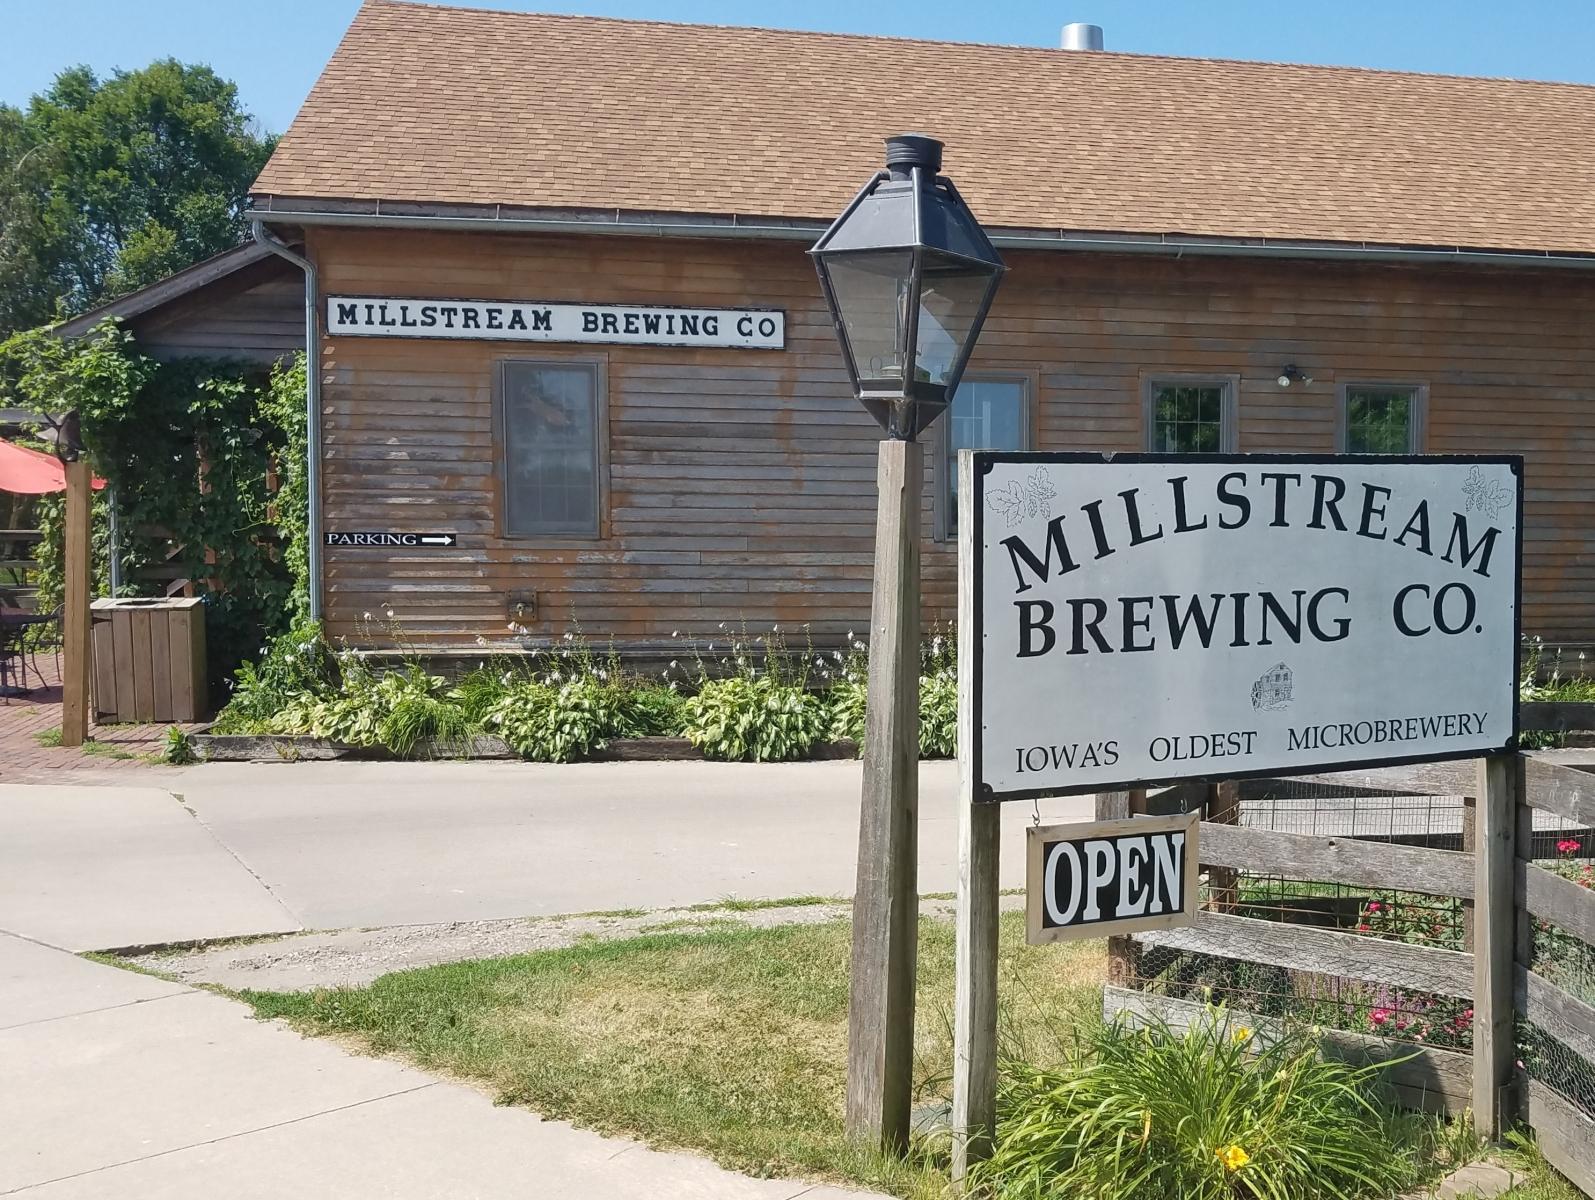 Millstream sign at driveway